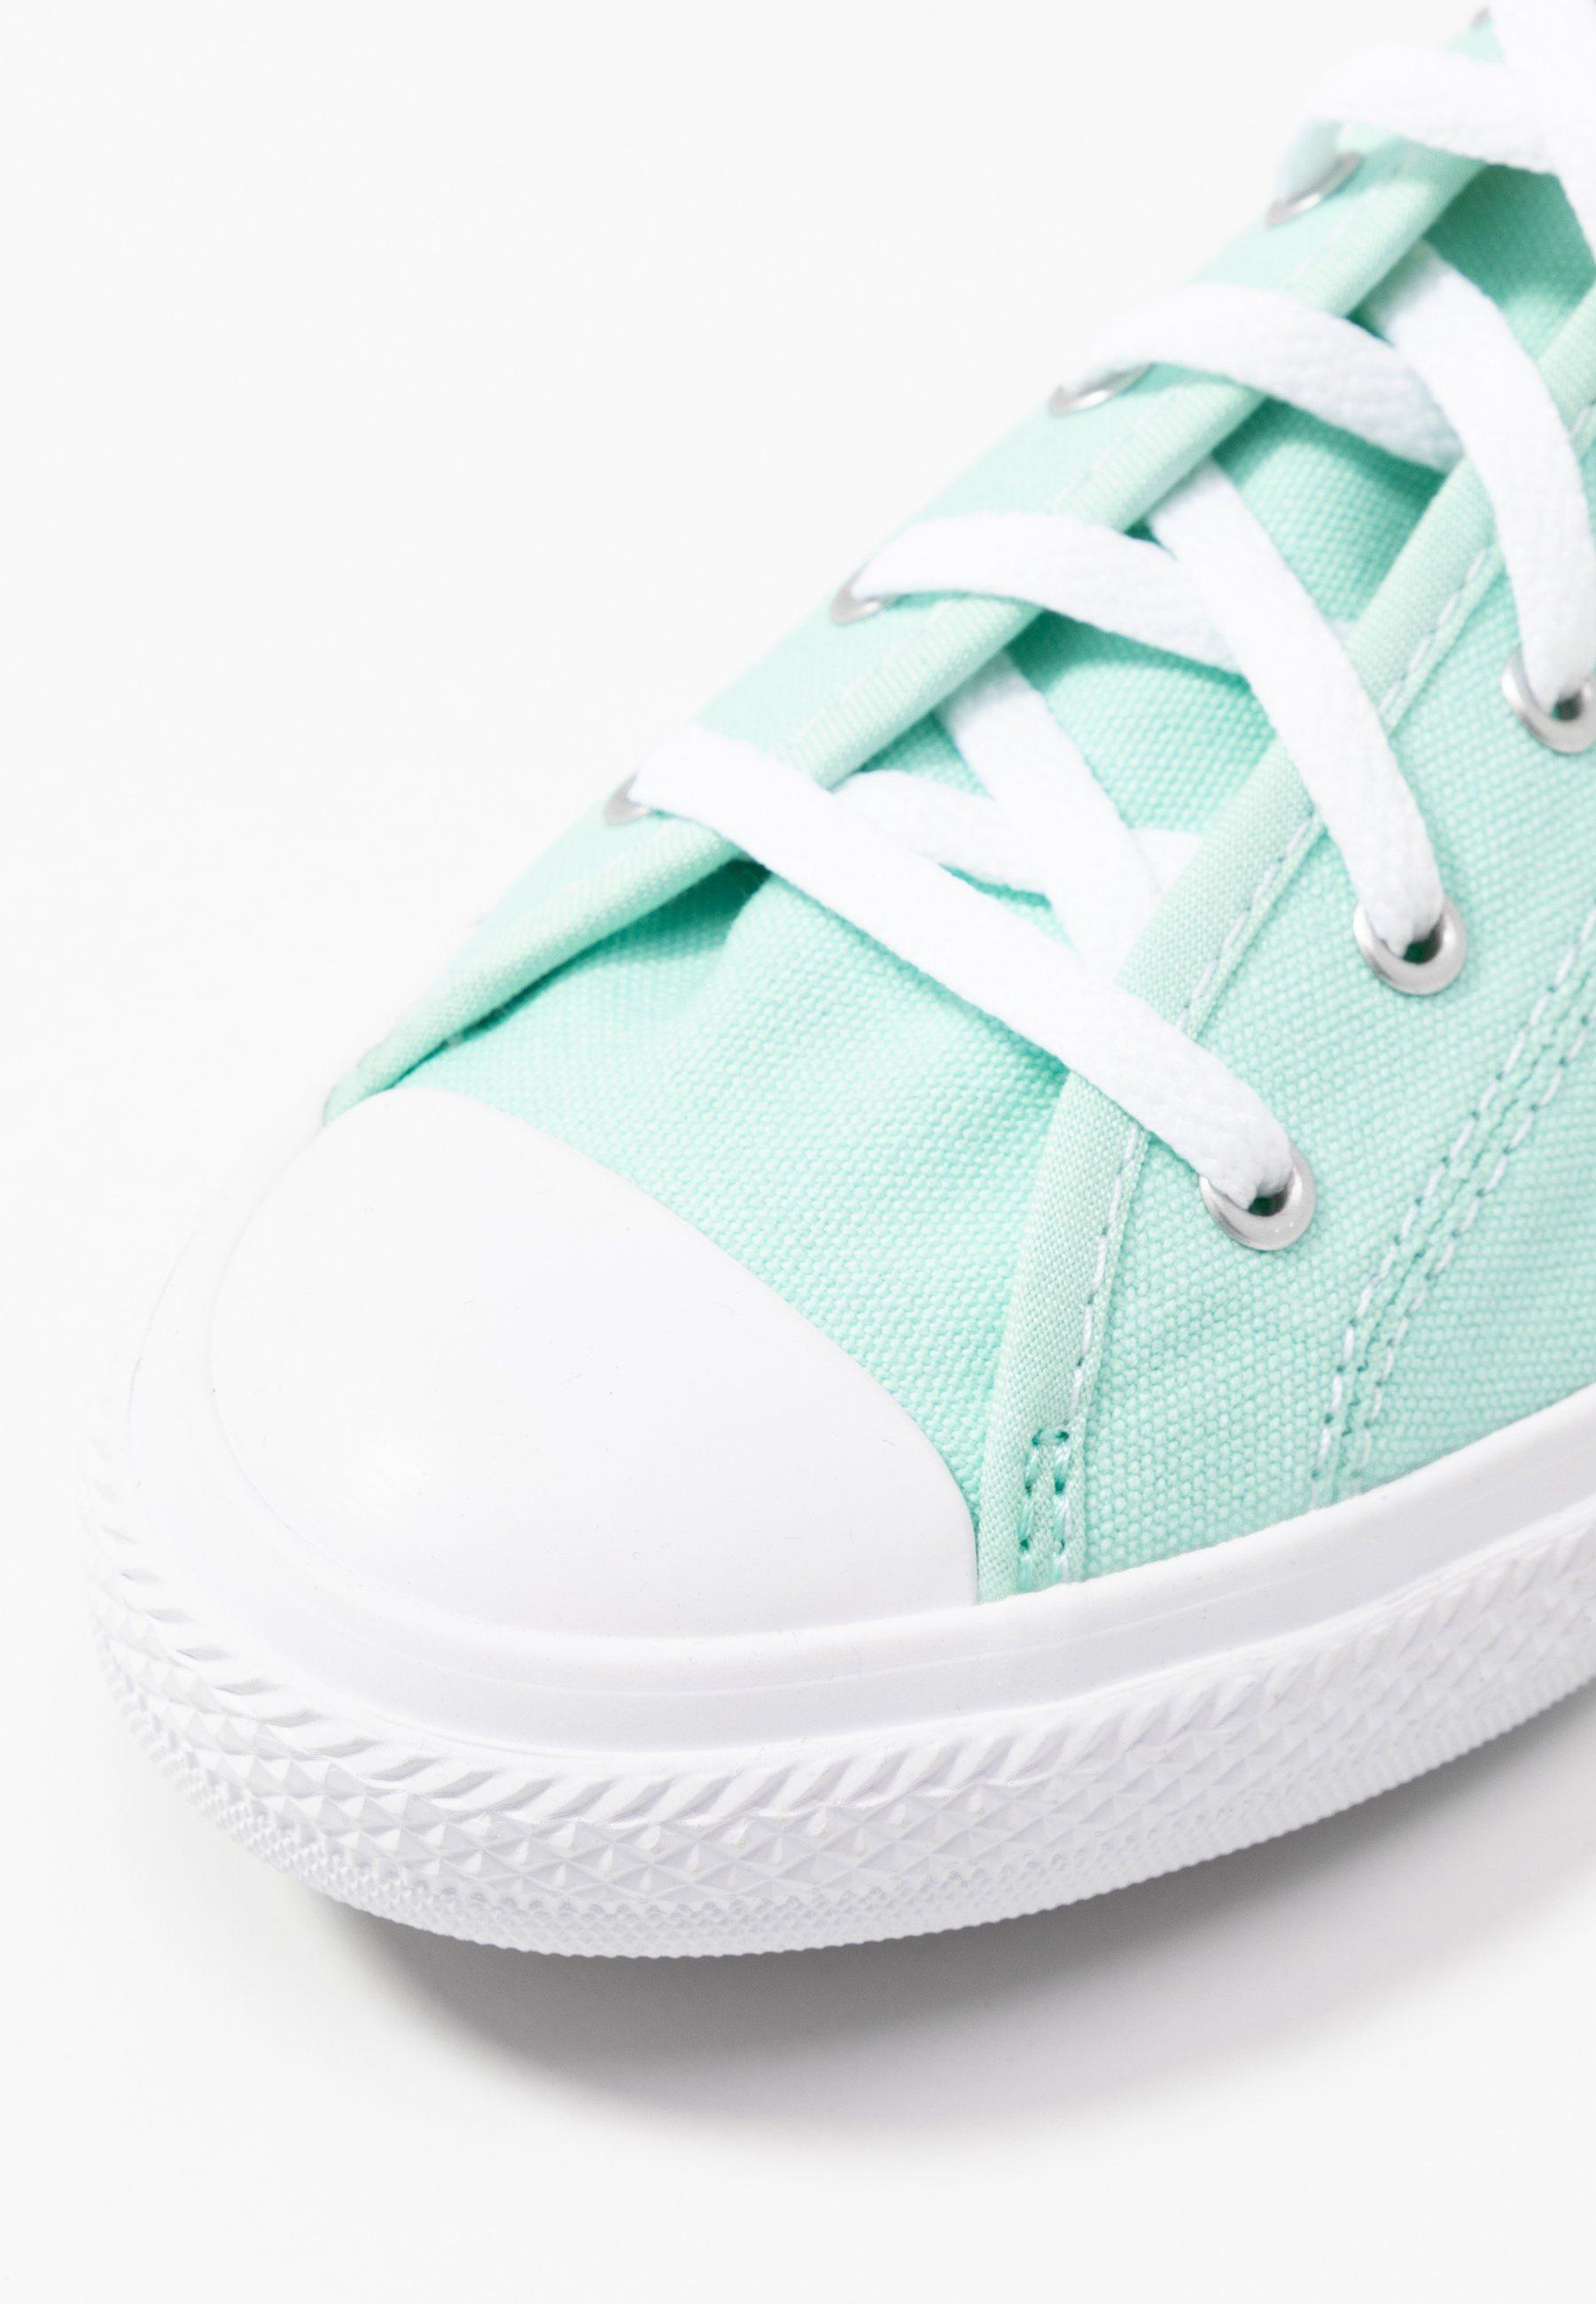 Converse Chuck Taylor All Star Dainty Seasonal - Joggesko Ocean Mint/white